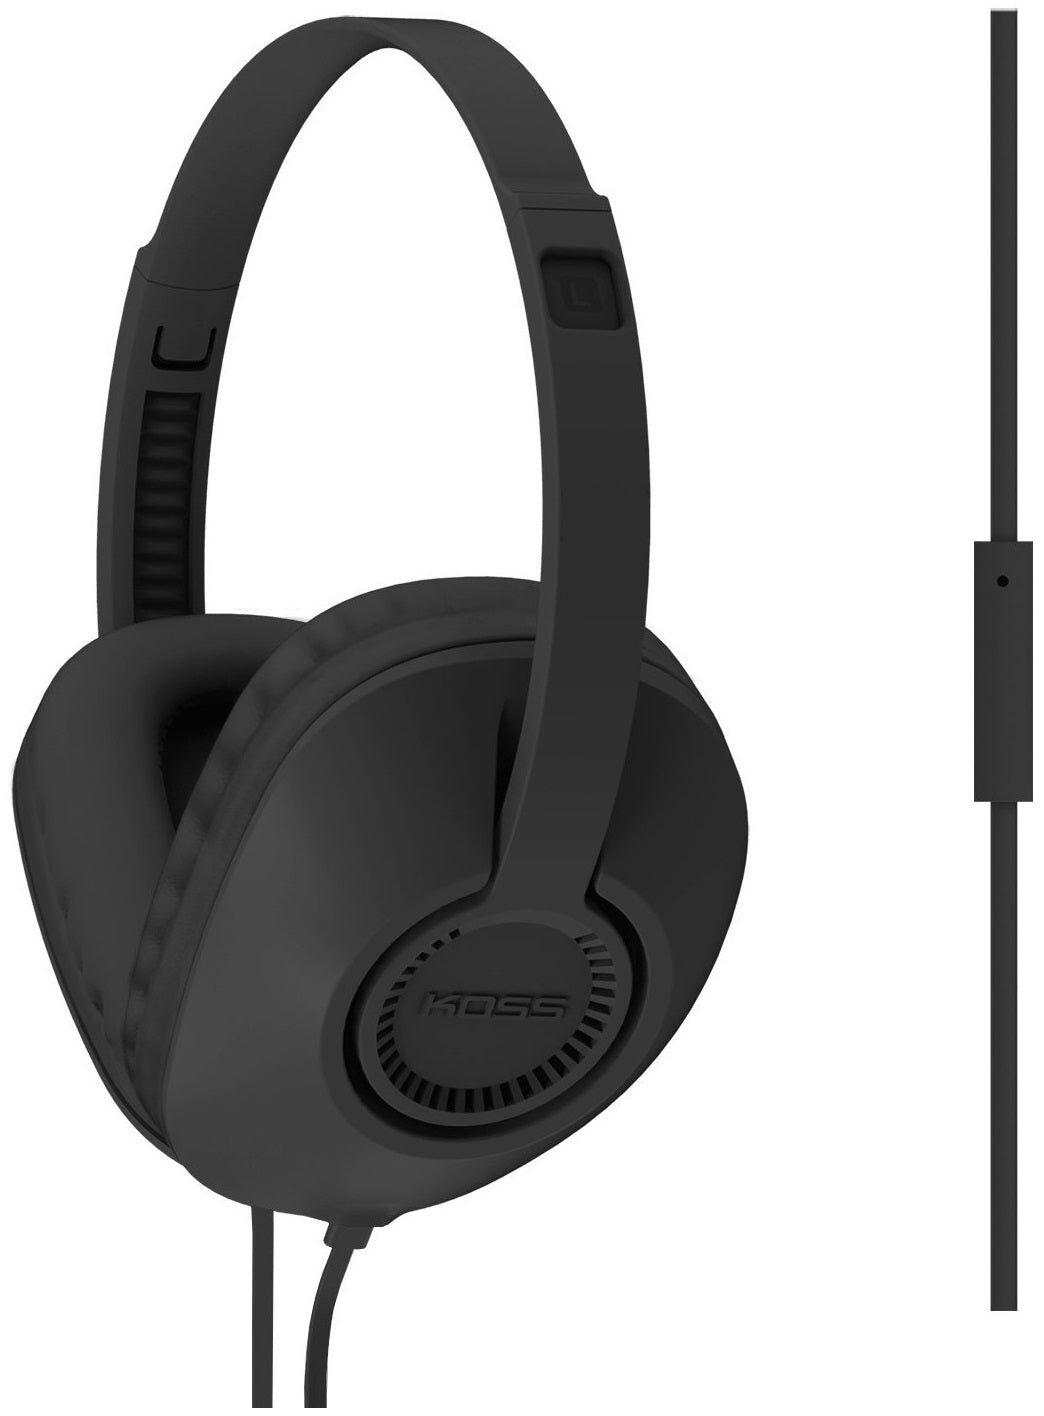 Koss 189270 Adjustable Headphone Stereo Overear, Black